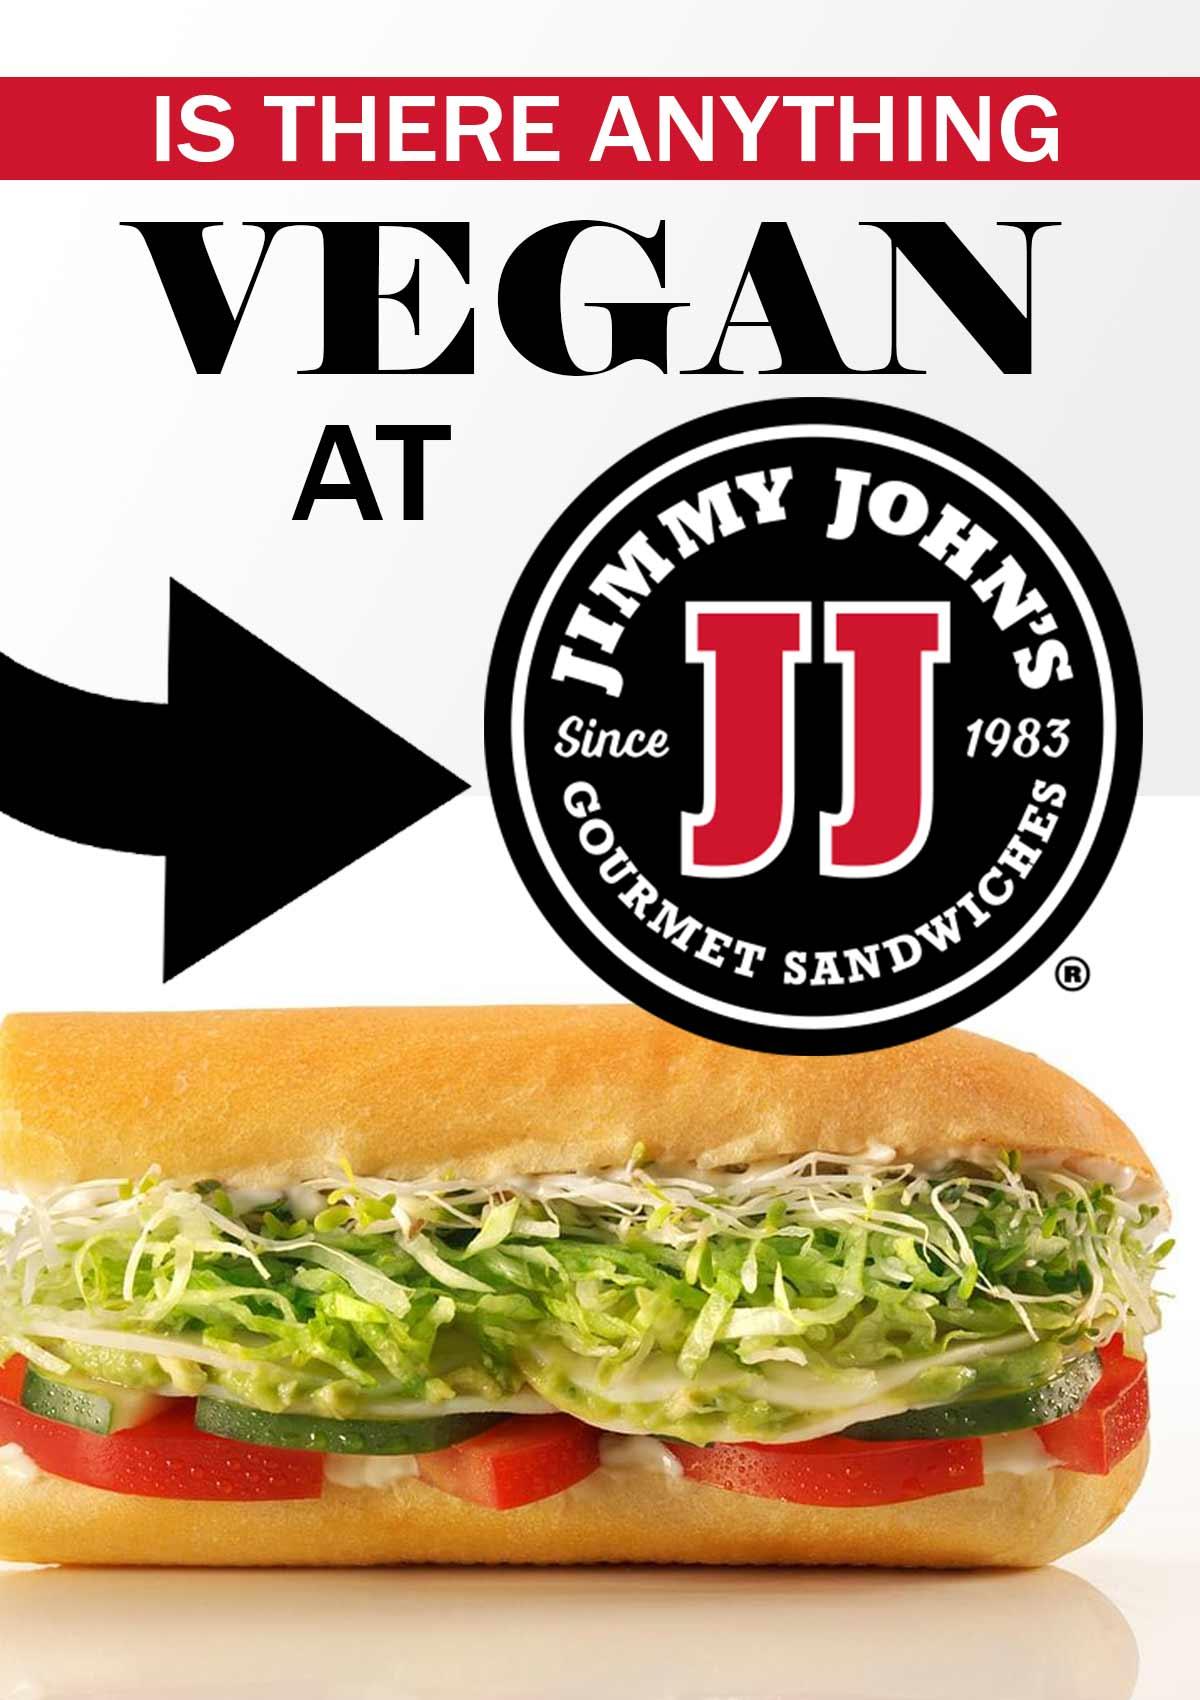 vegan options at jimmy johns.